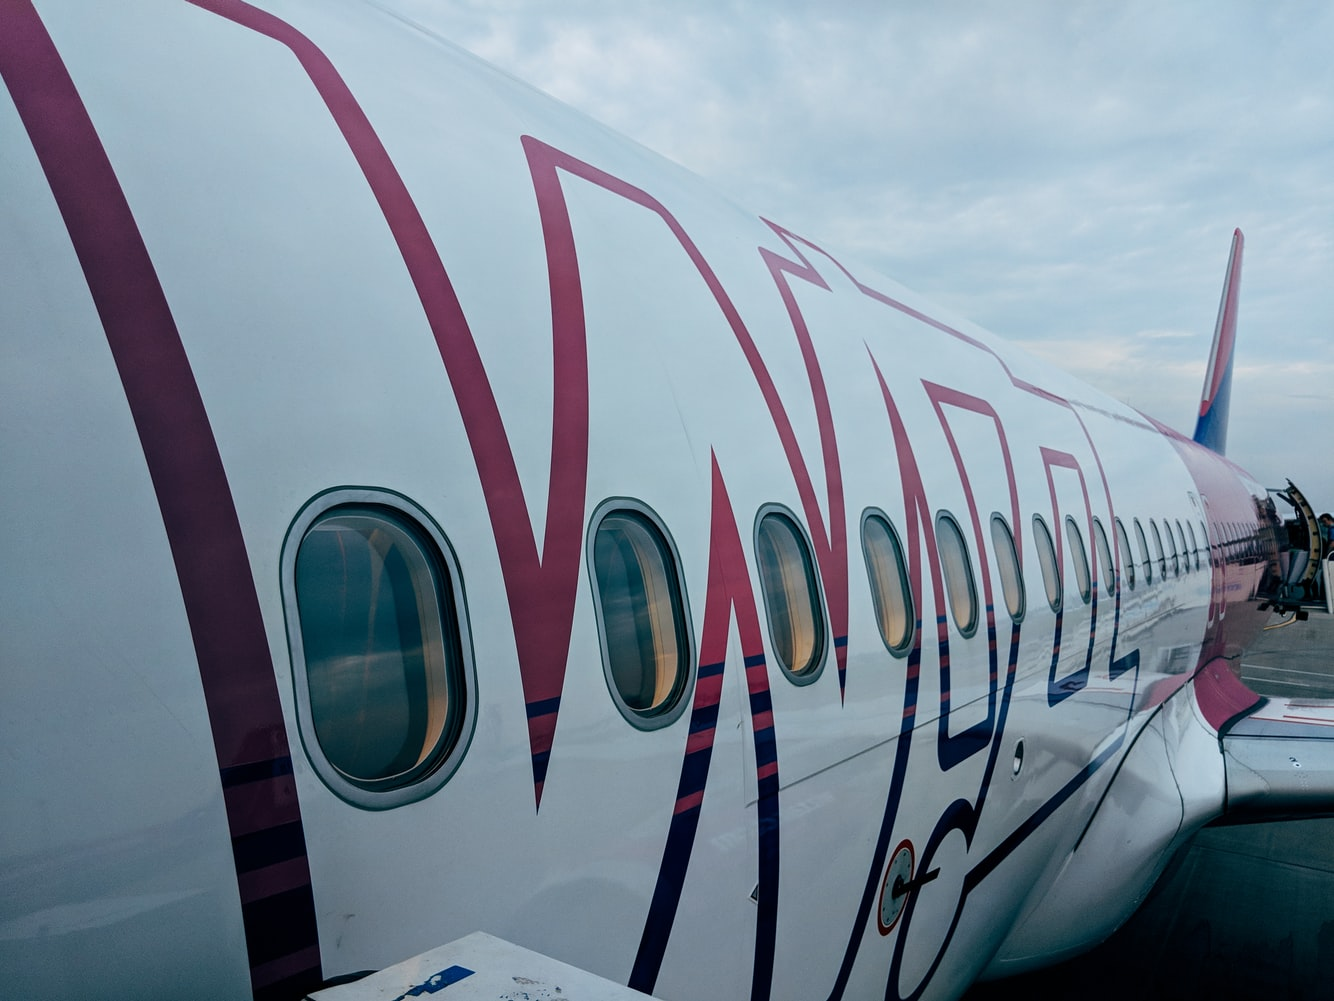 Od juna letovi iz BiH za Eindhoven, Basel, Malmo i Dortmund